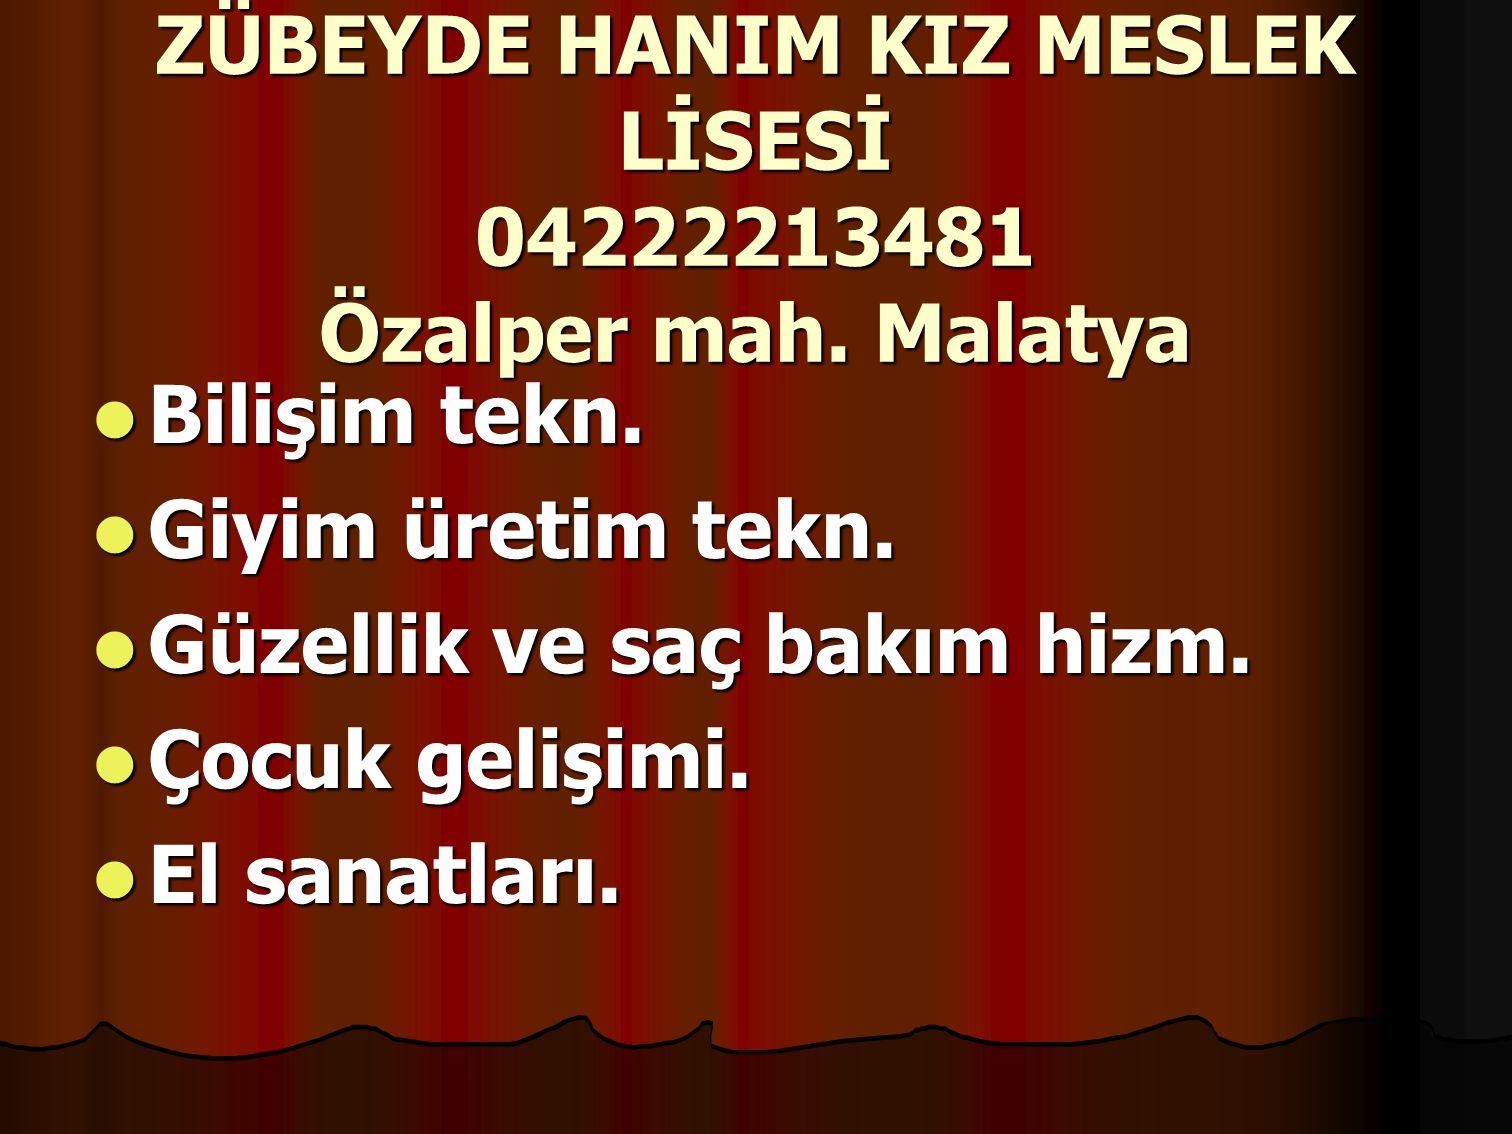 ZÜBEYDE HANIM KIZ MESLEK LİSESİ 04222213481 Özalper mah.